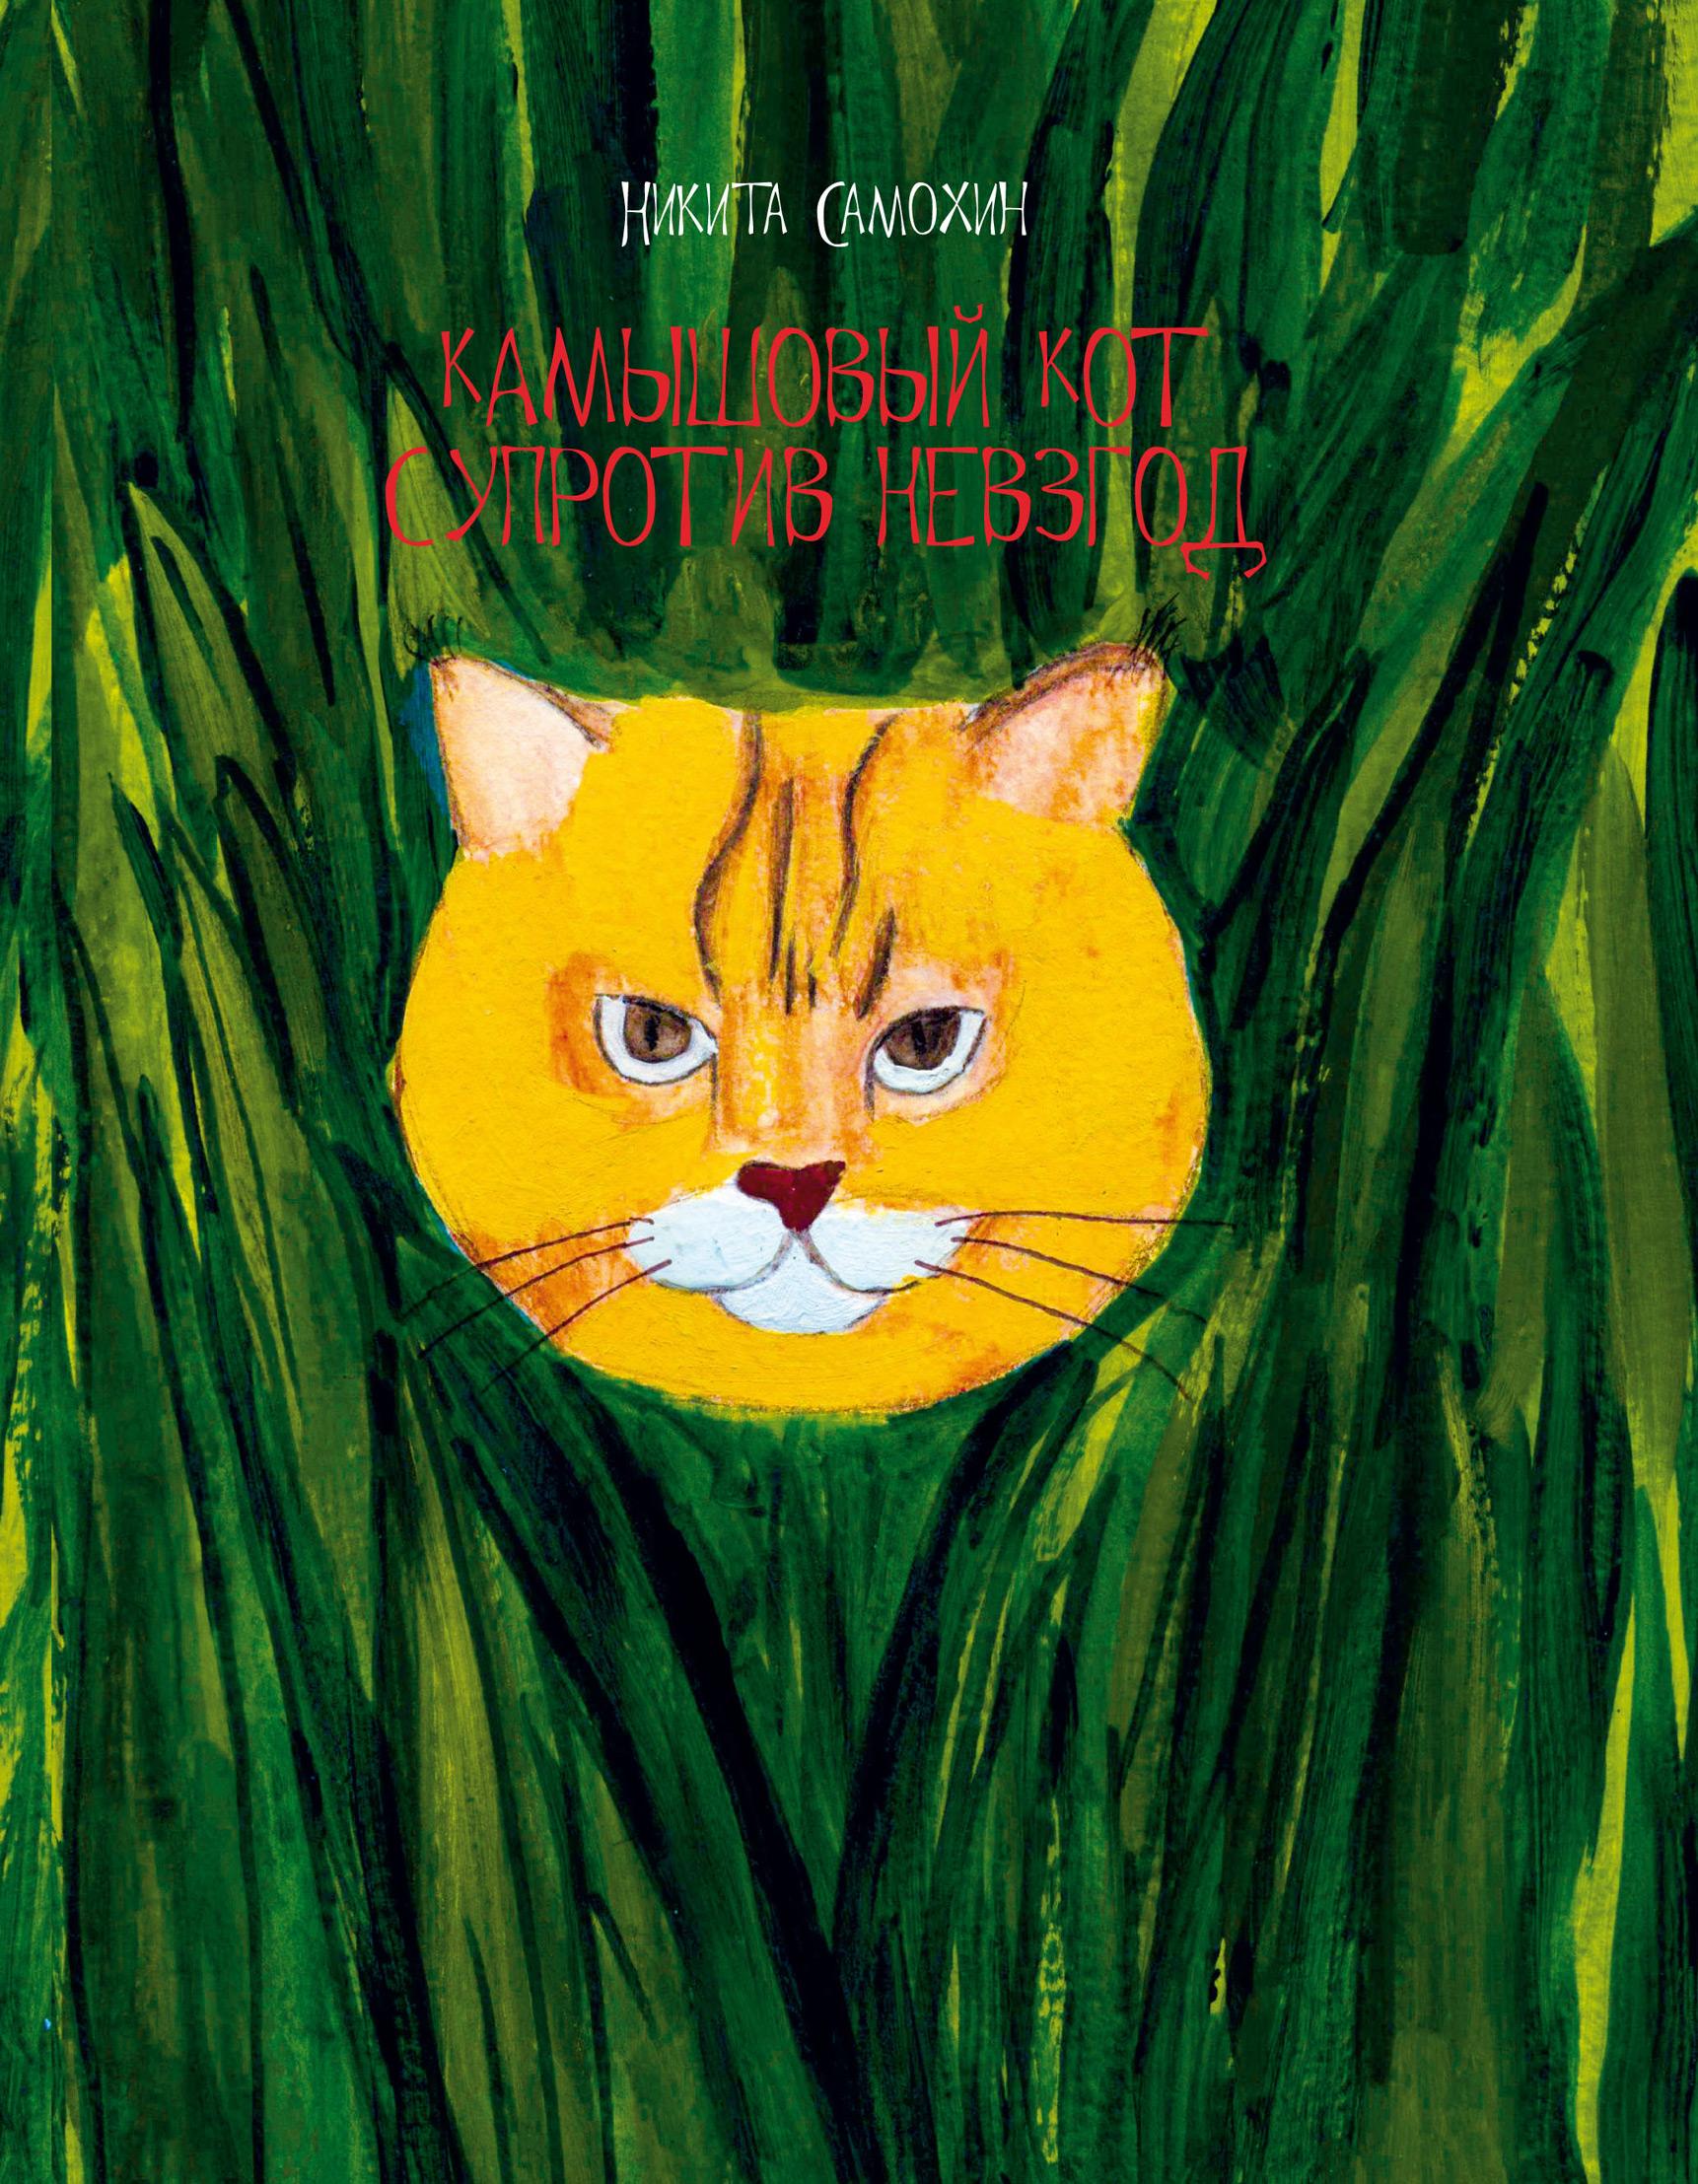 Никита Самохин Камышовый кот супротив невзгод никита самохин заряница